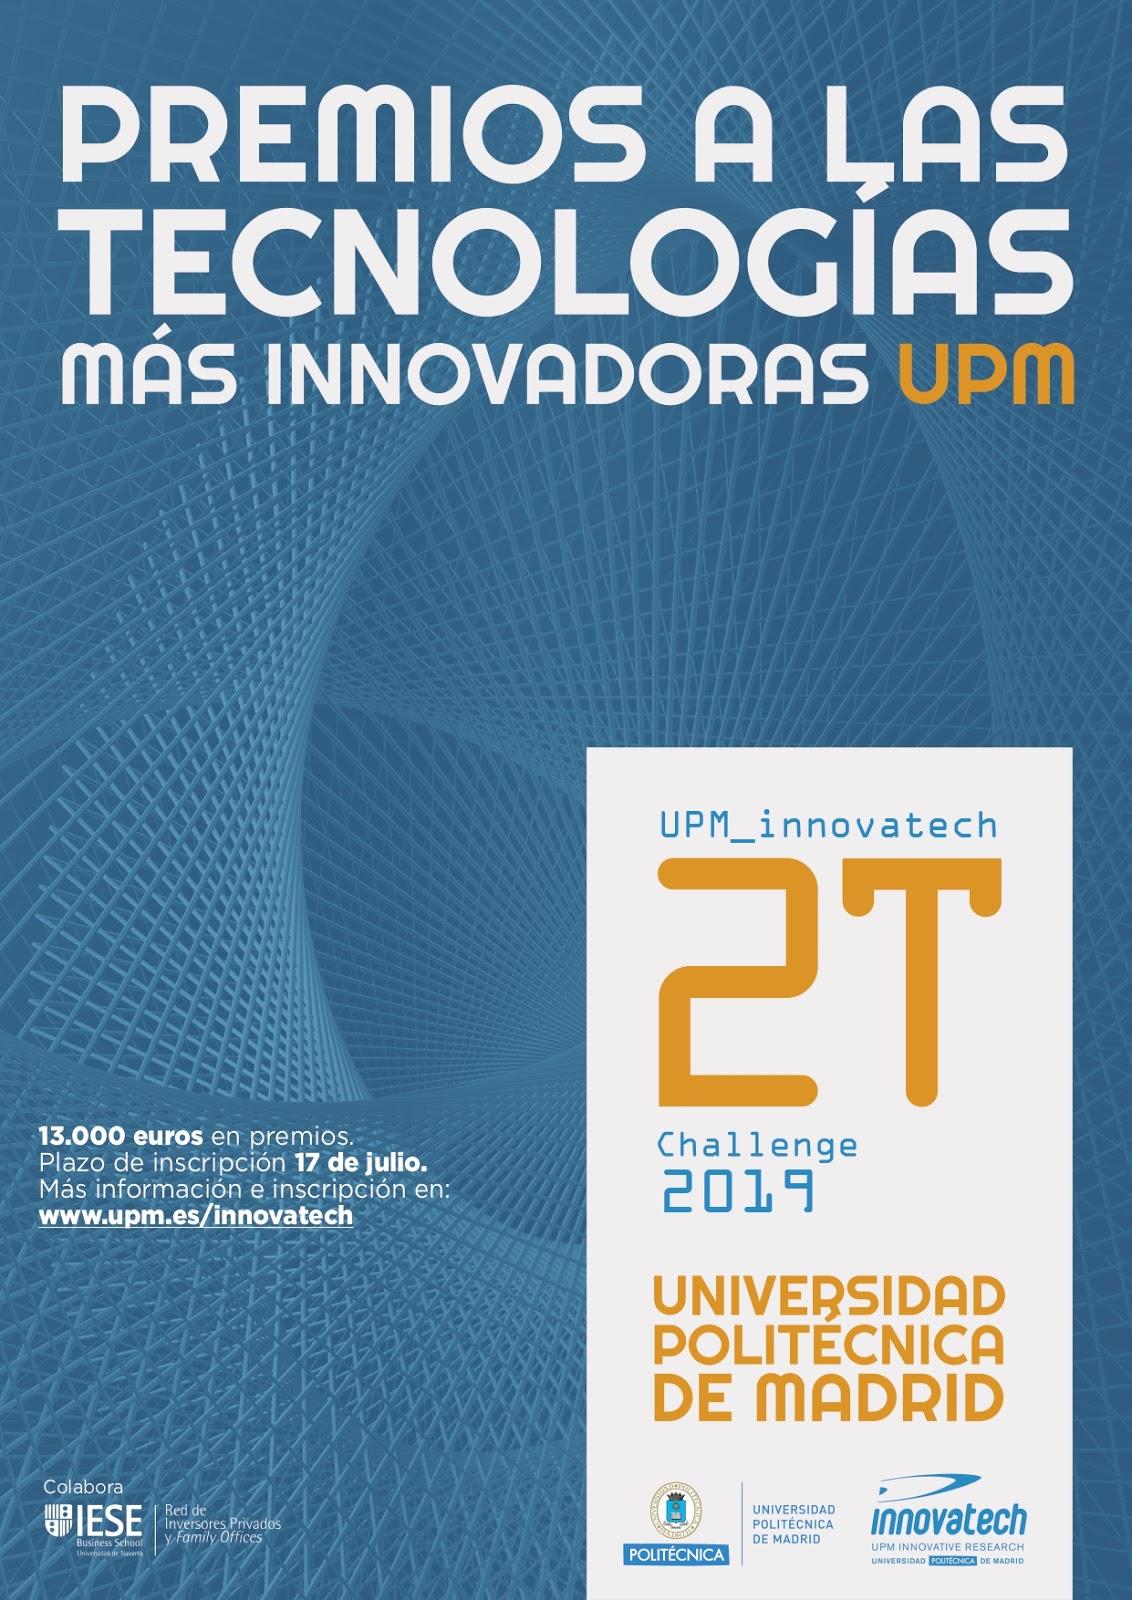 IV UPM_innovatech 2T Challenge 2019